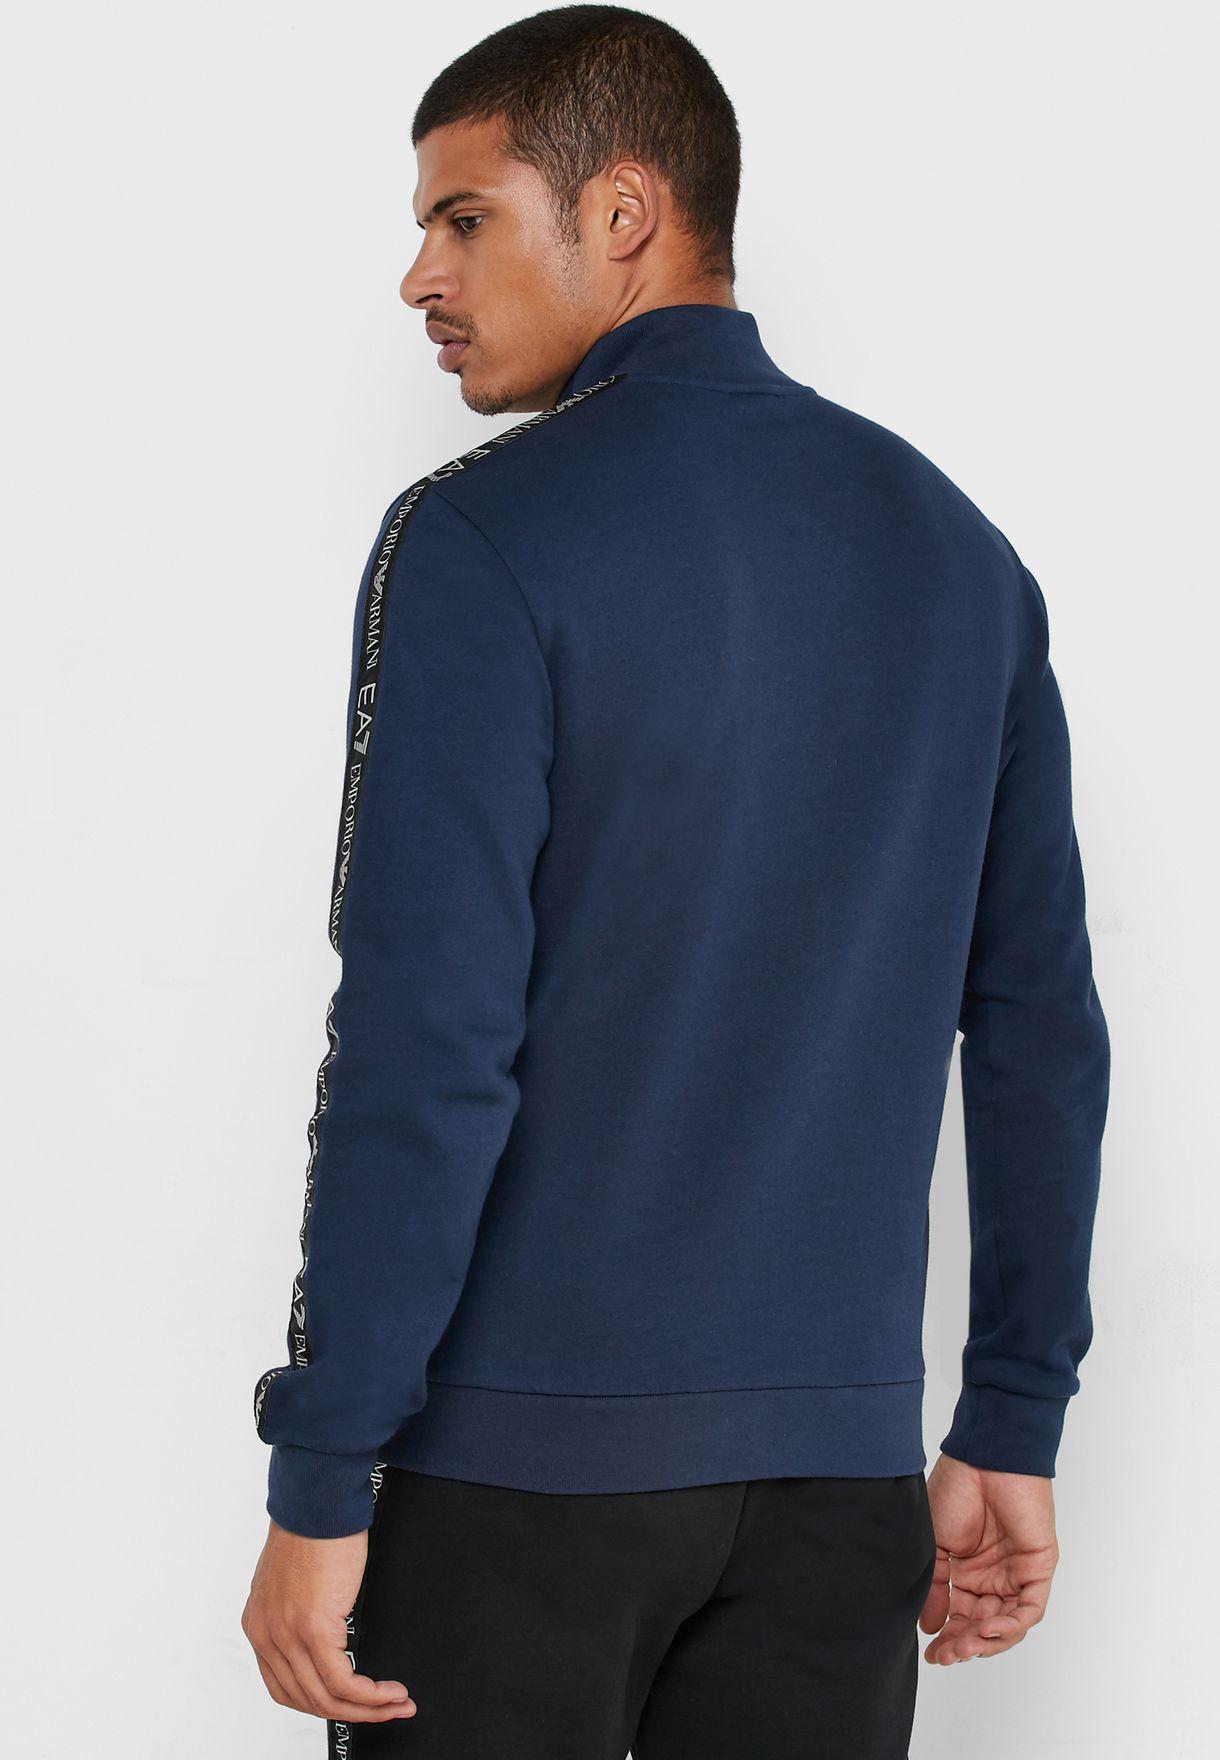 Logo Series Taped Sleeve  Jacket